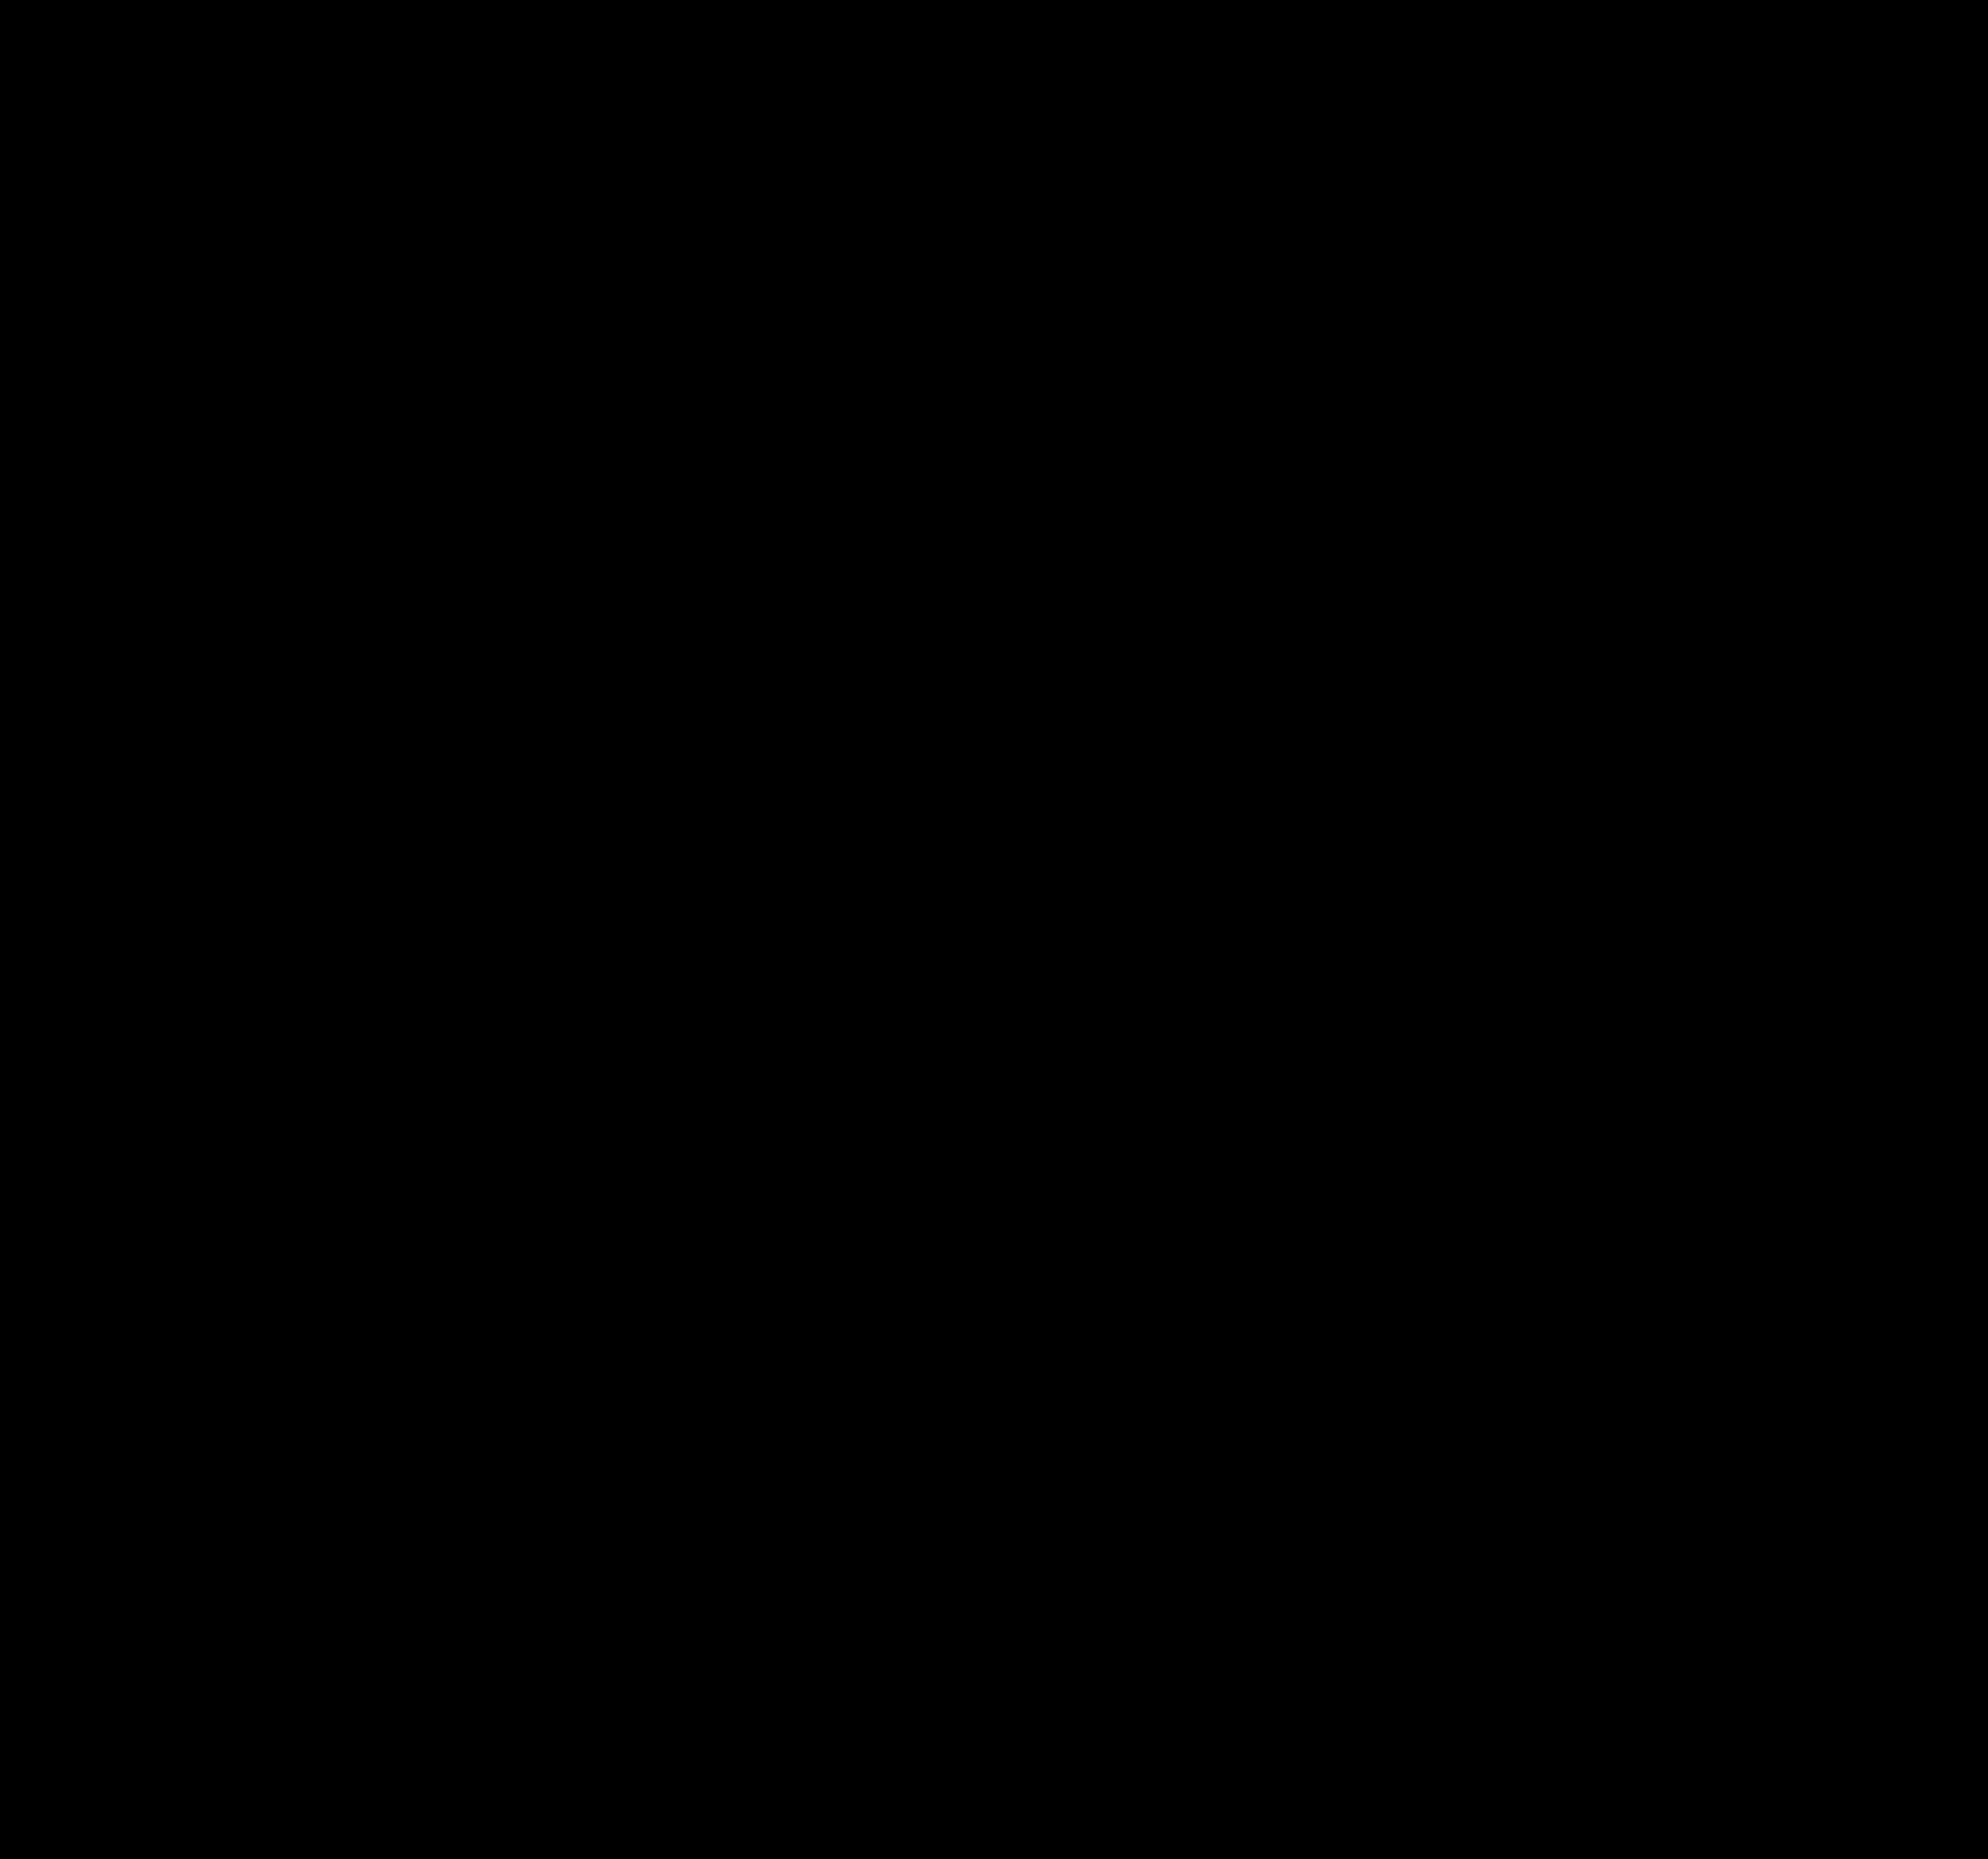 Transistor Schematic Symbol.